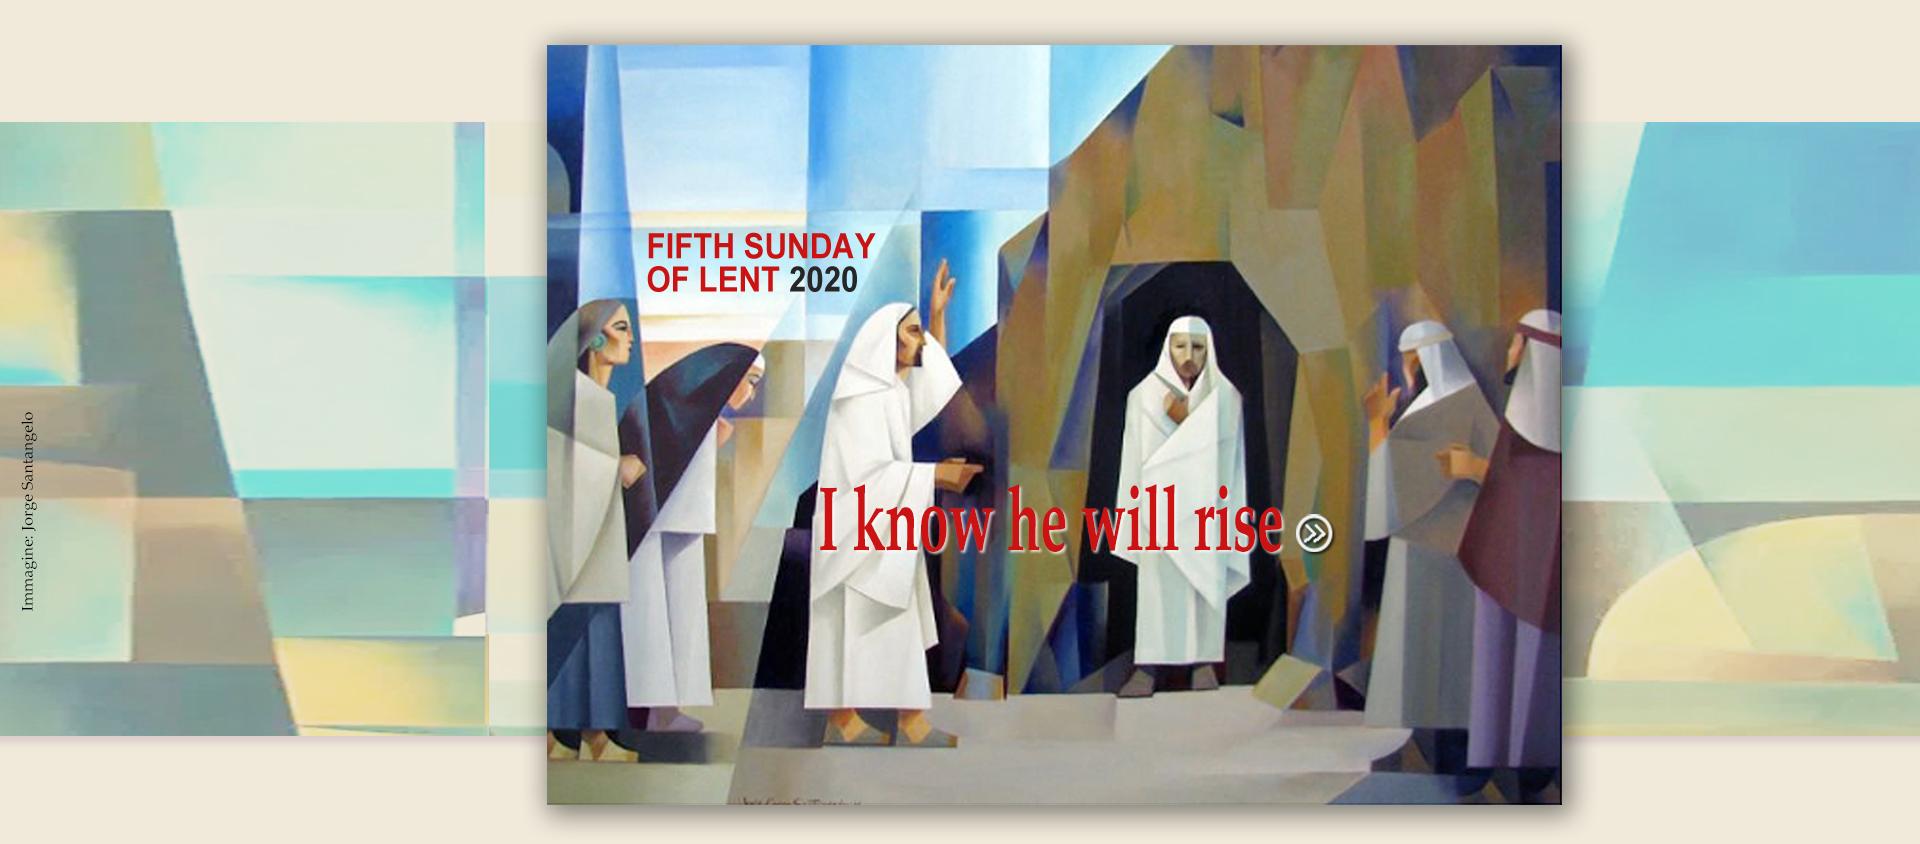 5 Sunday of Lent 2020